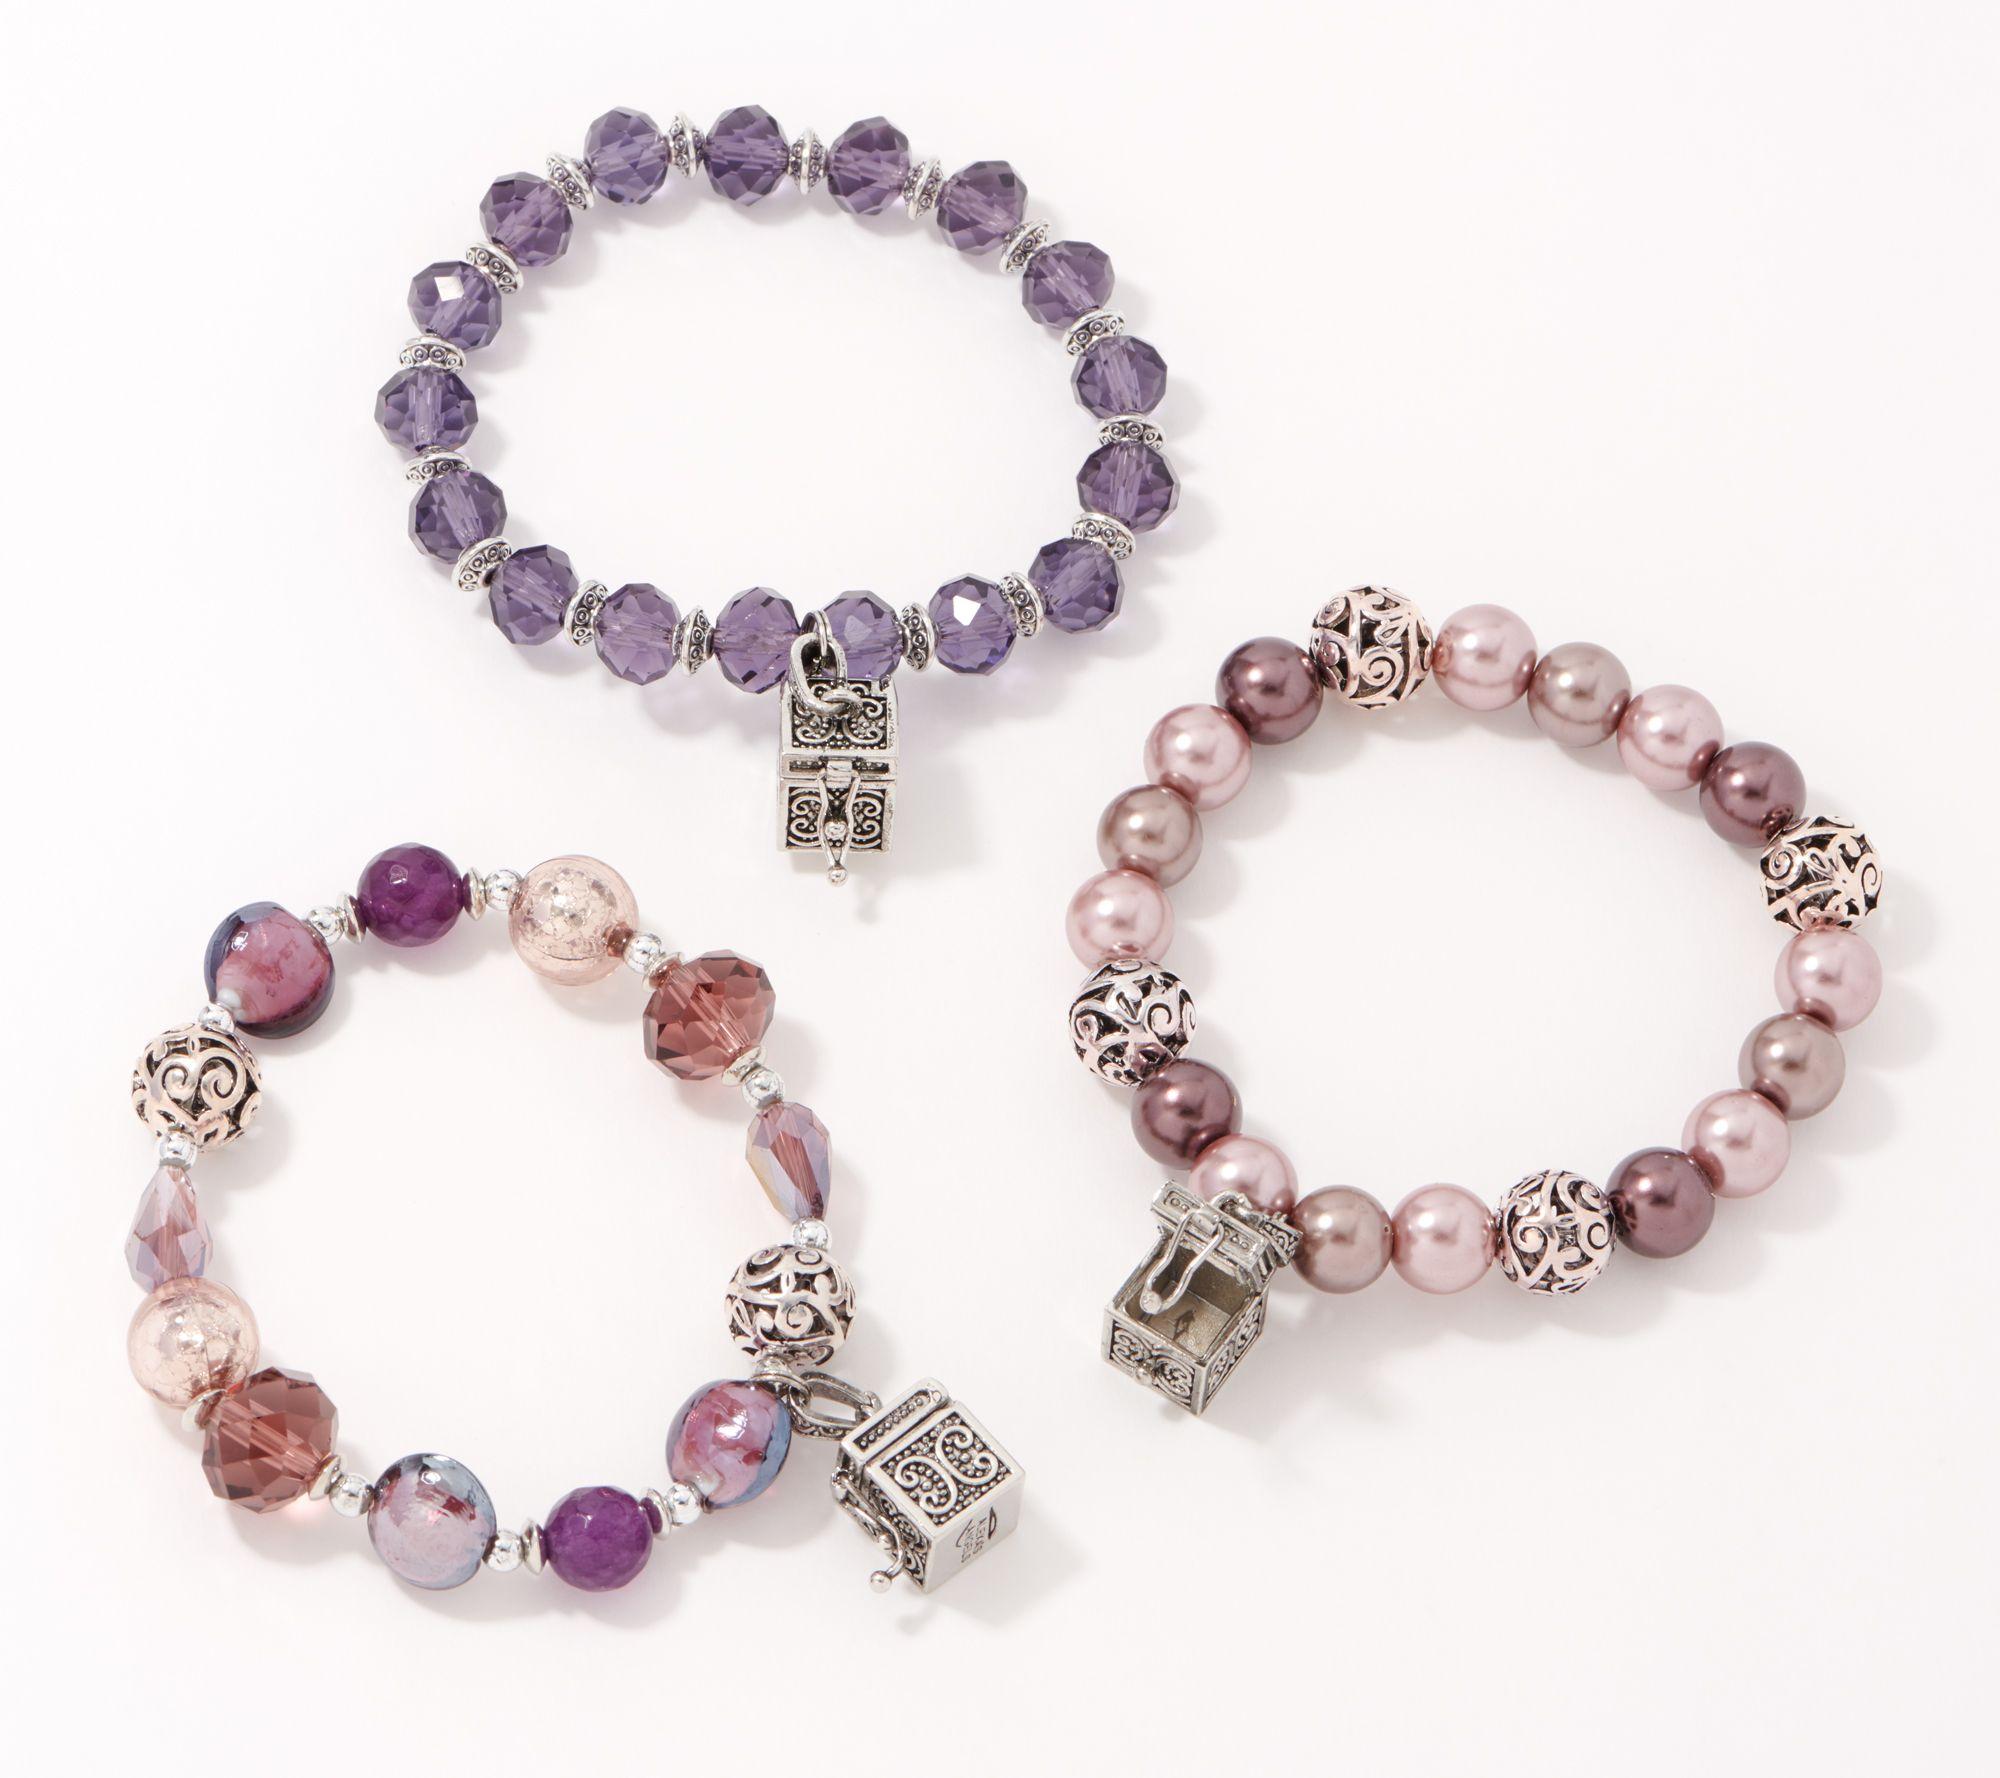 Prayer Box Bracelets With Sheer